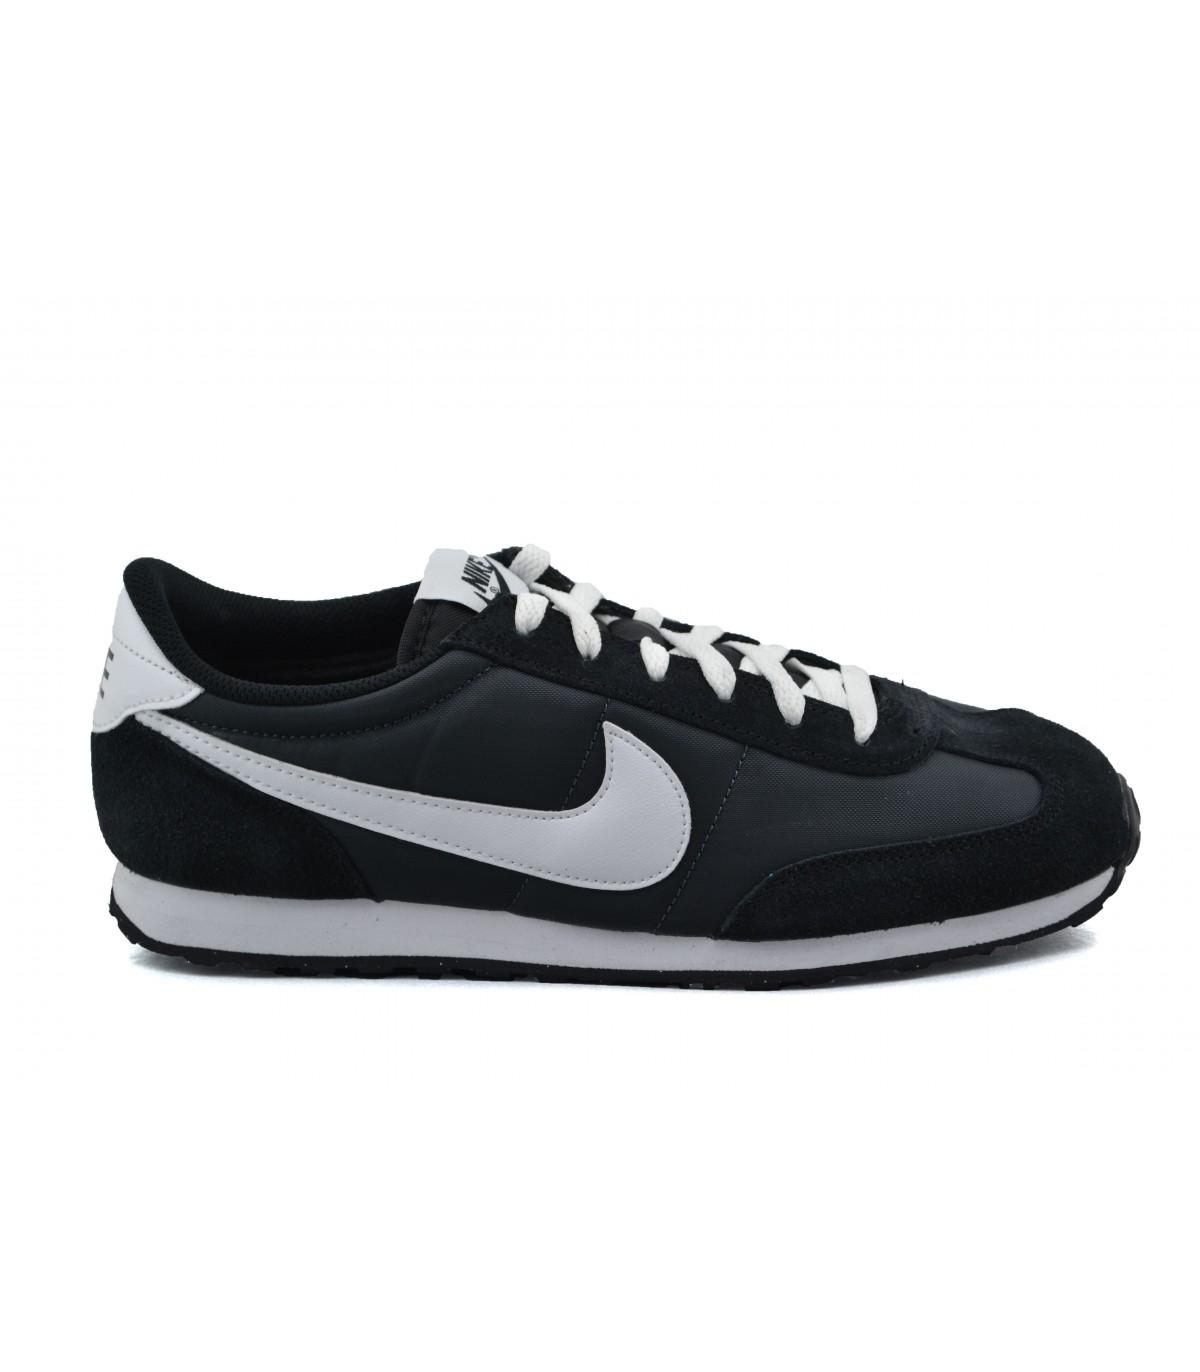 Nike Online Zapatos Runner 010 Calzado Hombre Deportivas Mach RxwqYvAq5